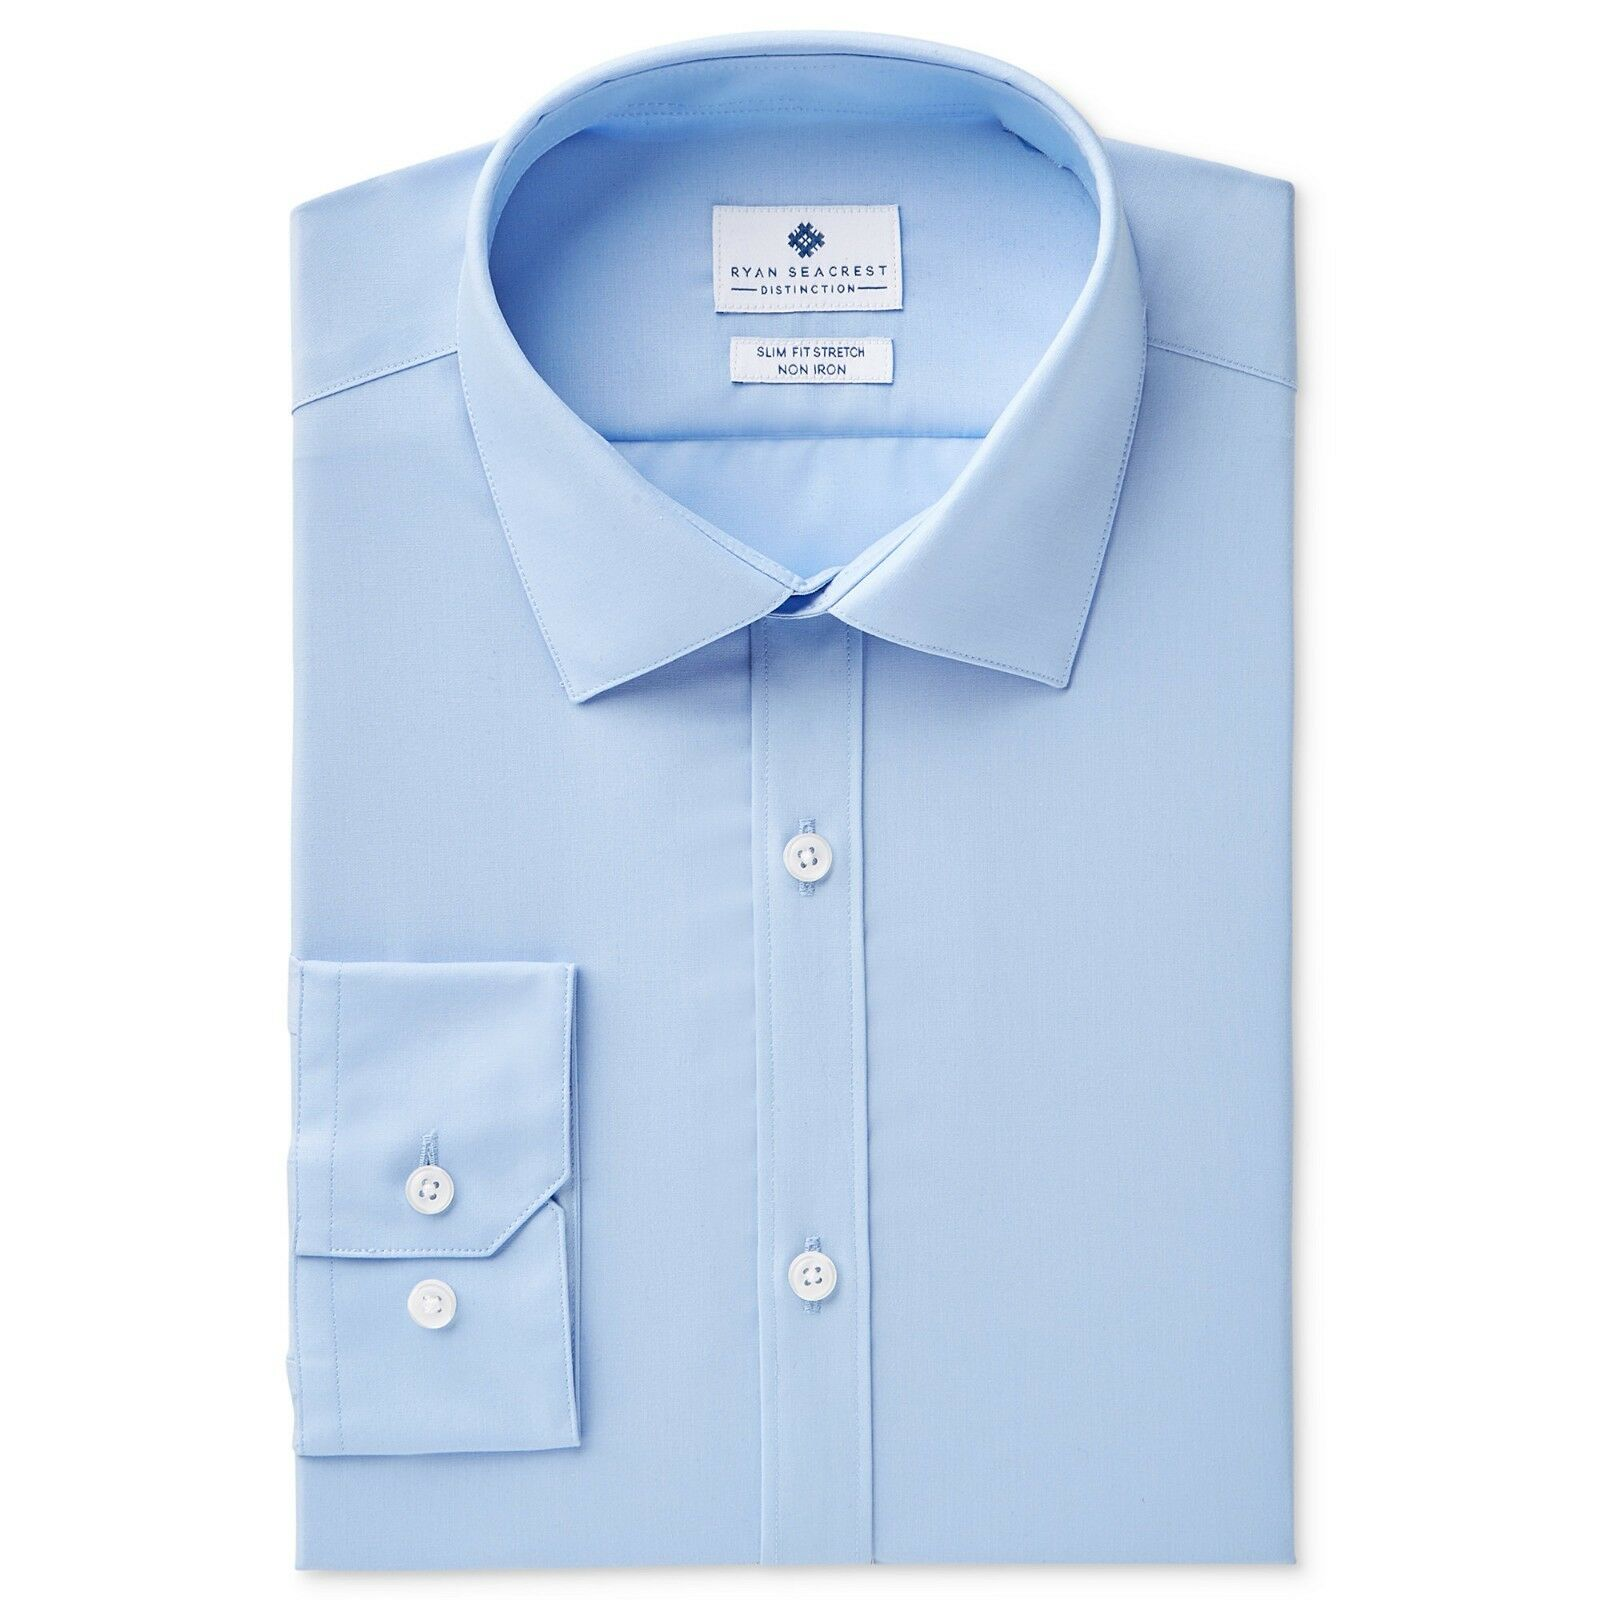 $99 Ryan Seacrest Men Slim-Fit White French-Cuff Tuxedo Dress Shirt 16.5 32//33 L